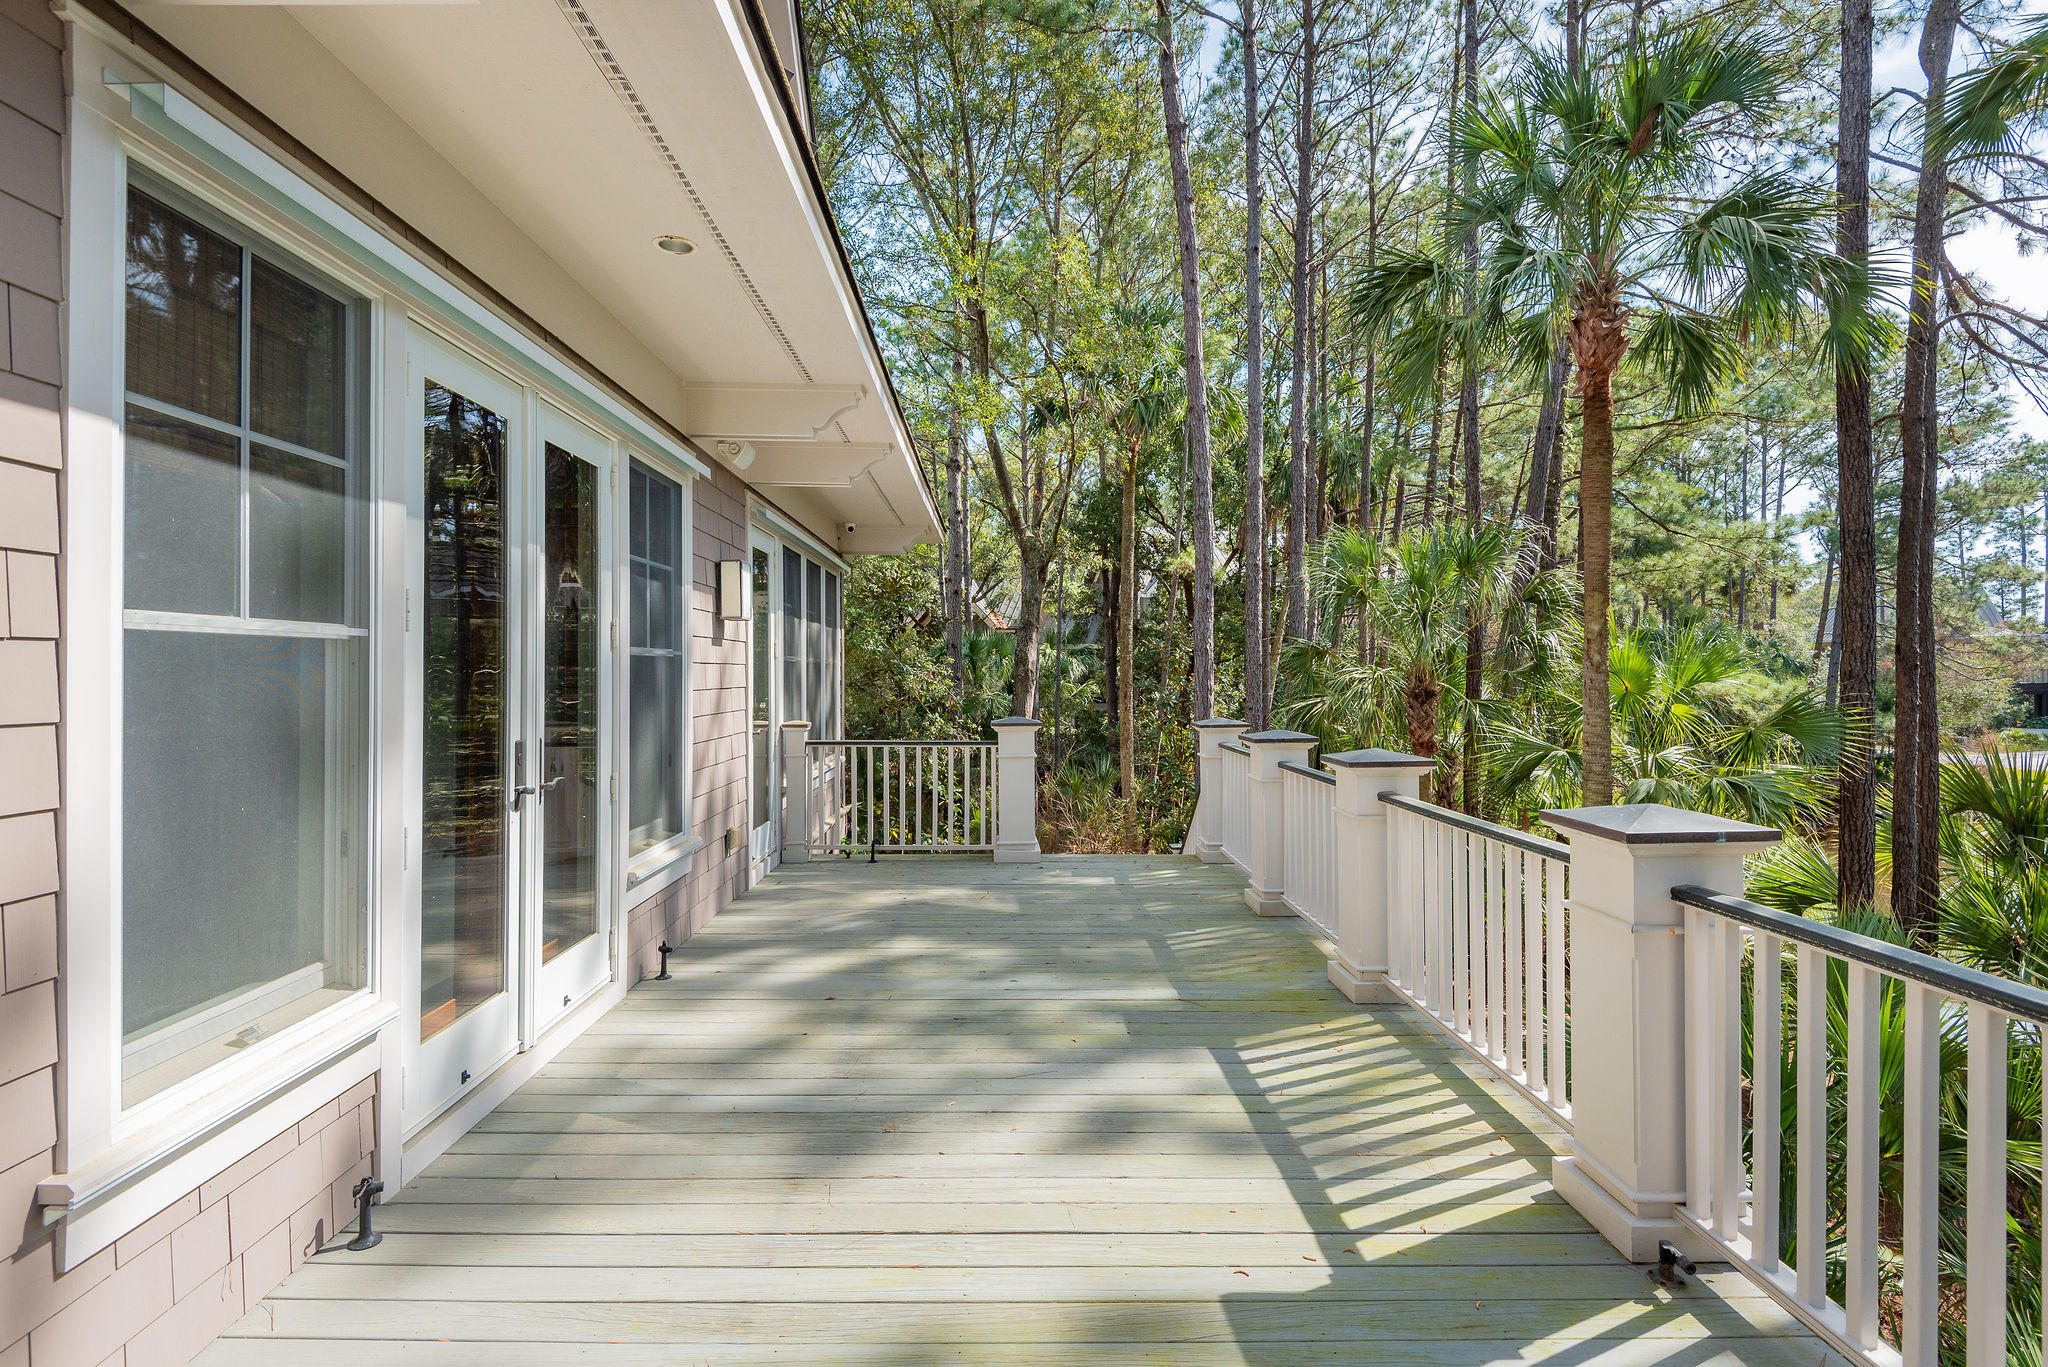 Kiawah Island Homes For Sale - 3 Grey Widgeon, Kiawah Island, SC - 28